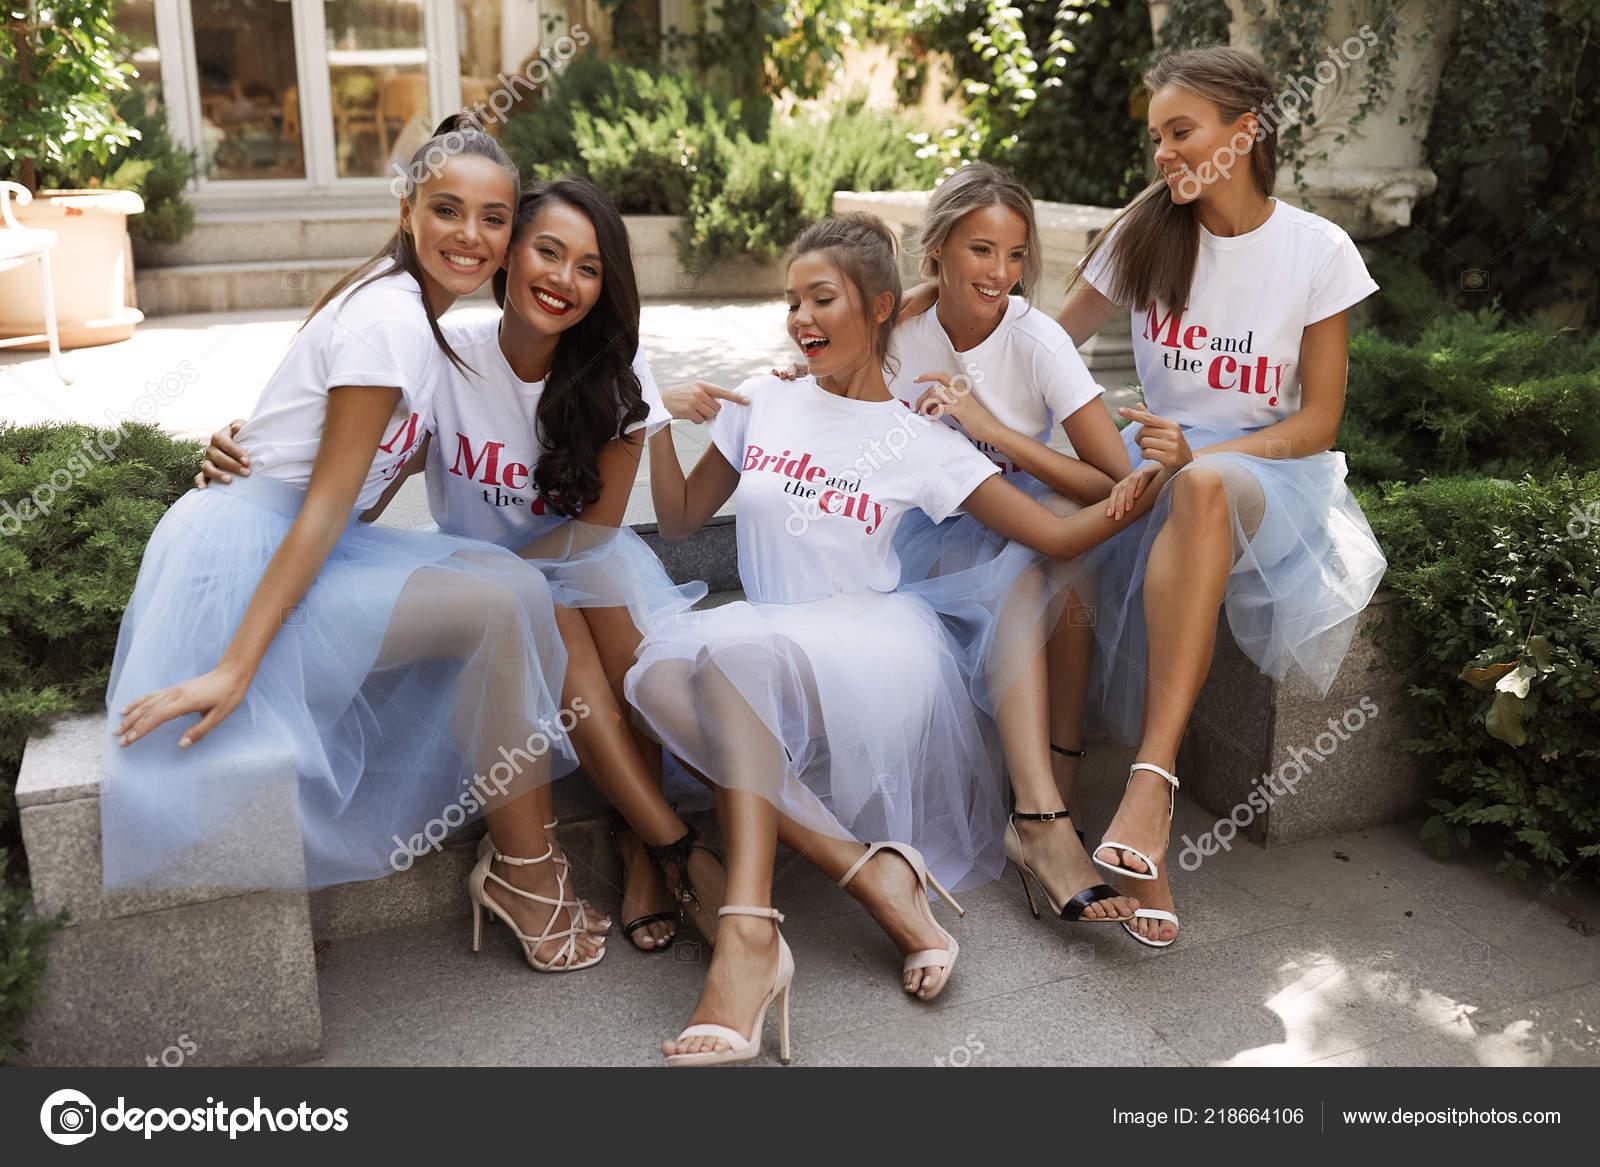 6d5c1a6a57e9 Σέξι Κοπέλες Στο Φως Μπλε Και Λευκό Shirts Φούστες Τίτλο — Φωτογραφία  Αρχείου